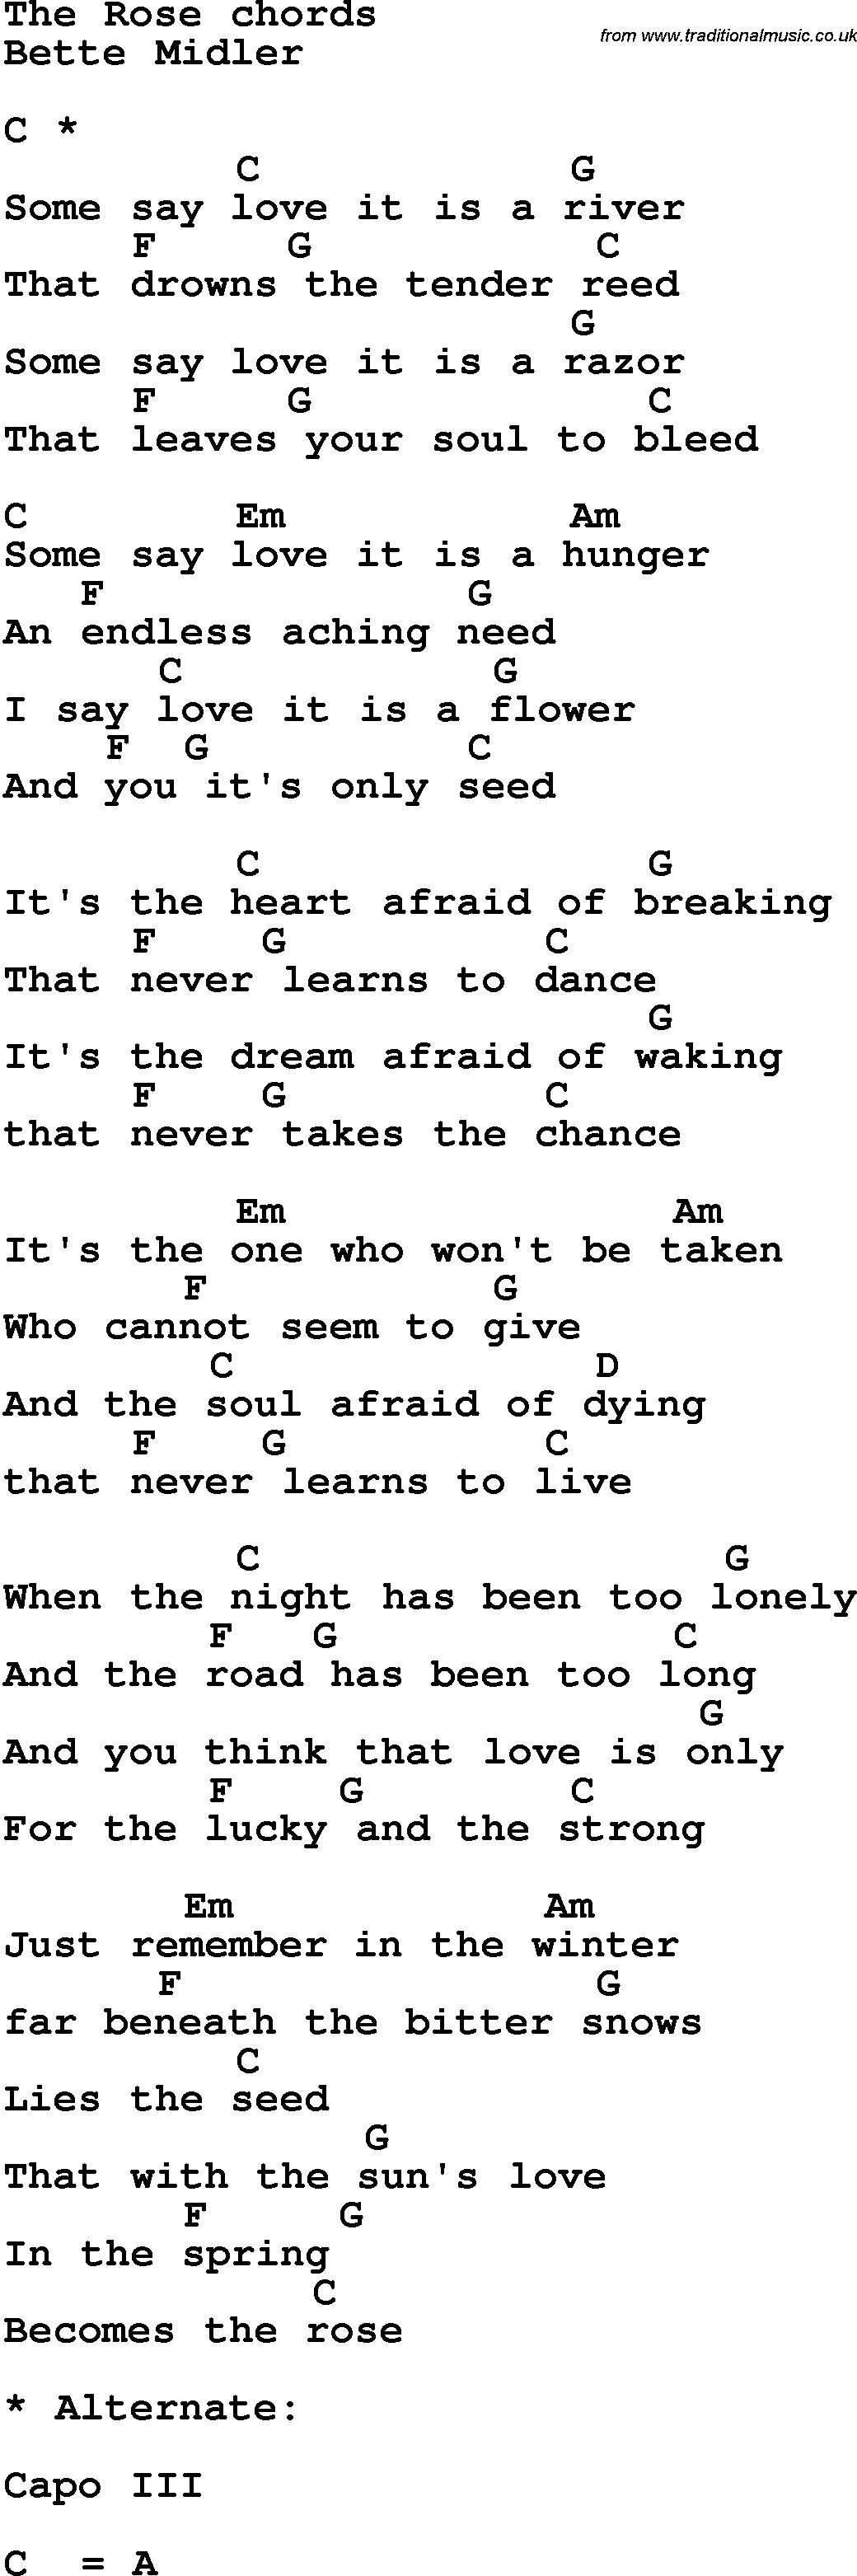 Song Lyrics With Guitar Chords For The Rose Bette Midler Ukulele